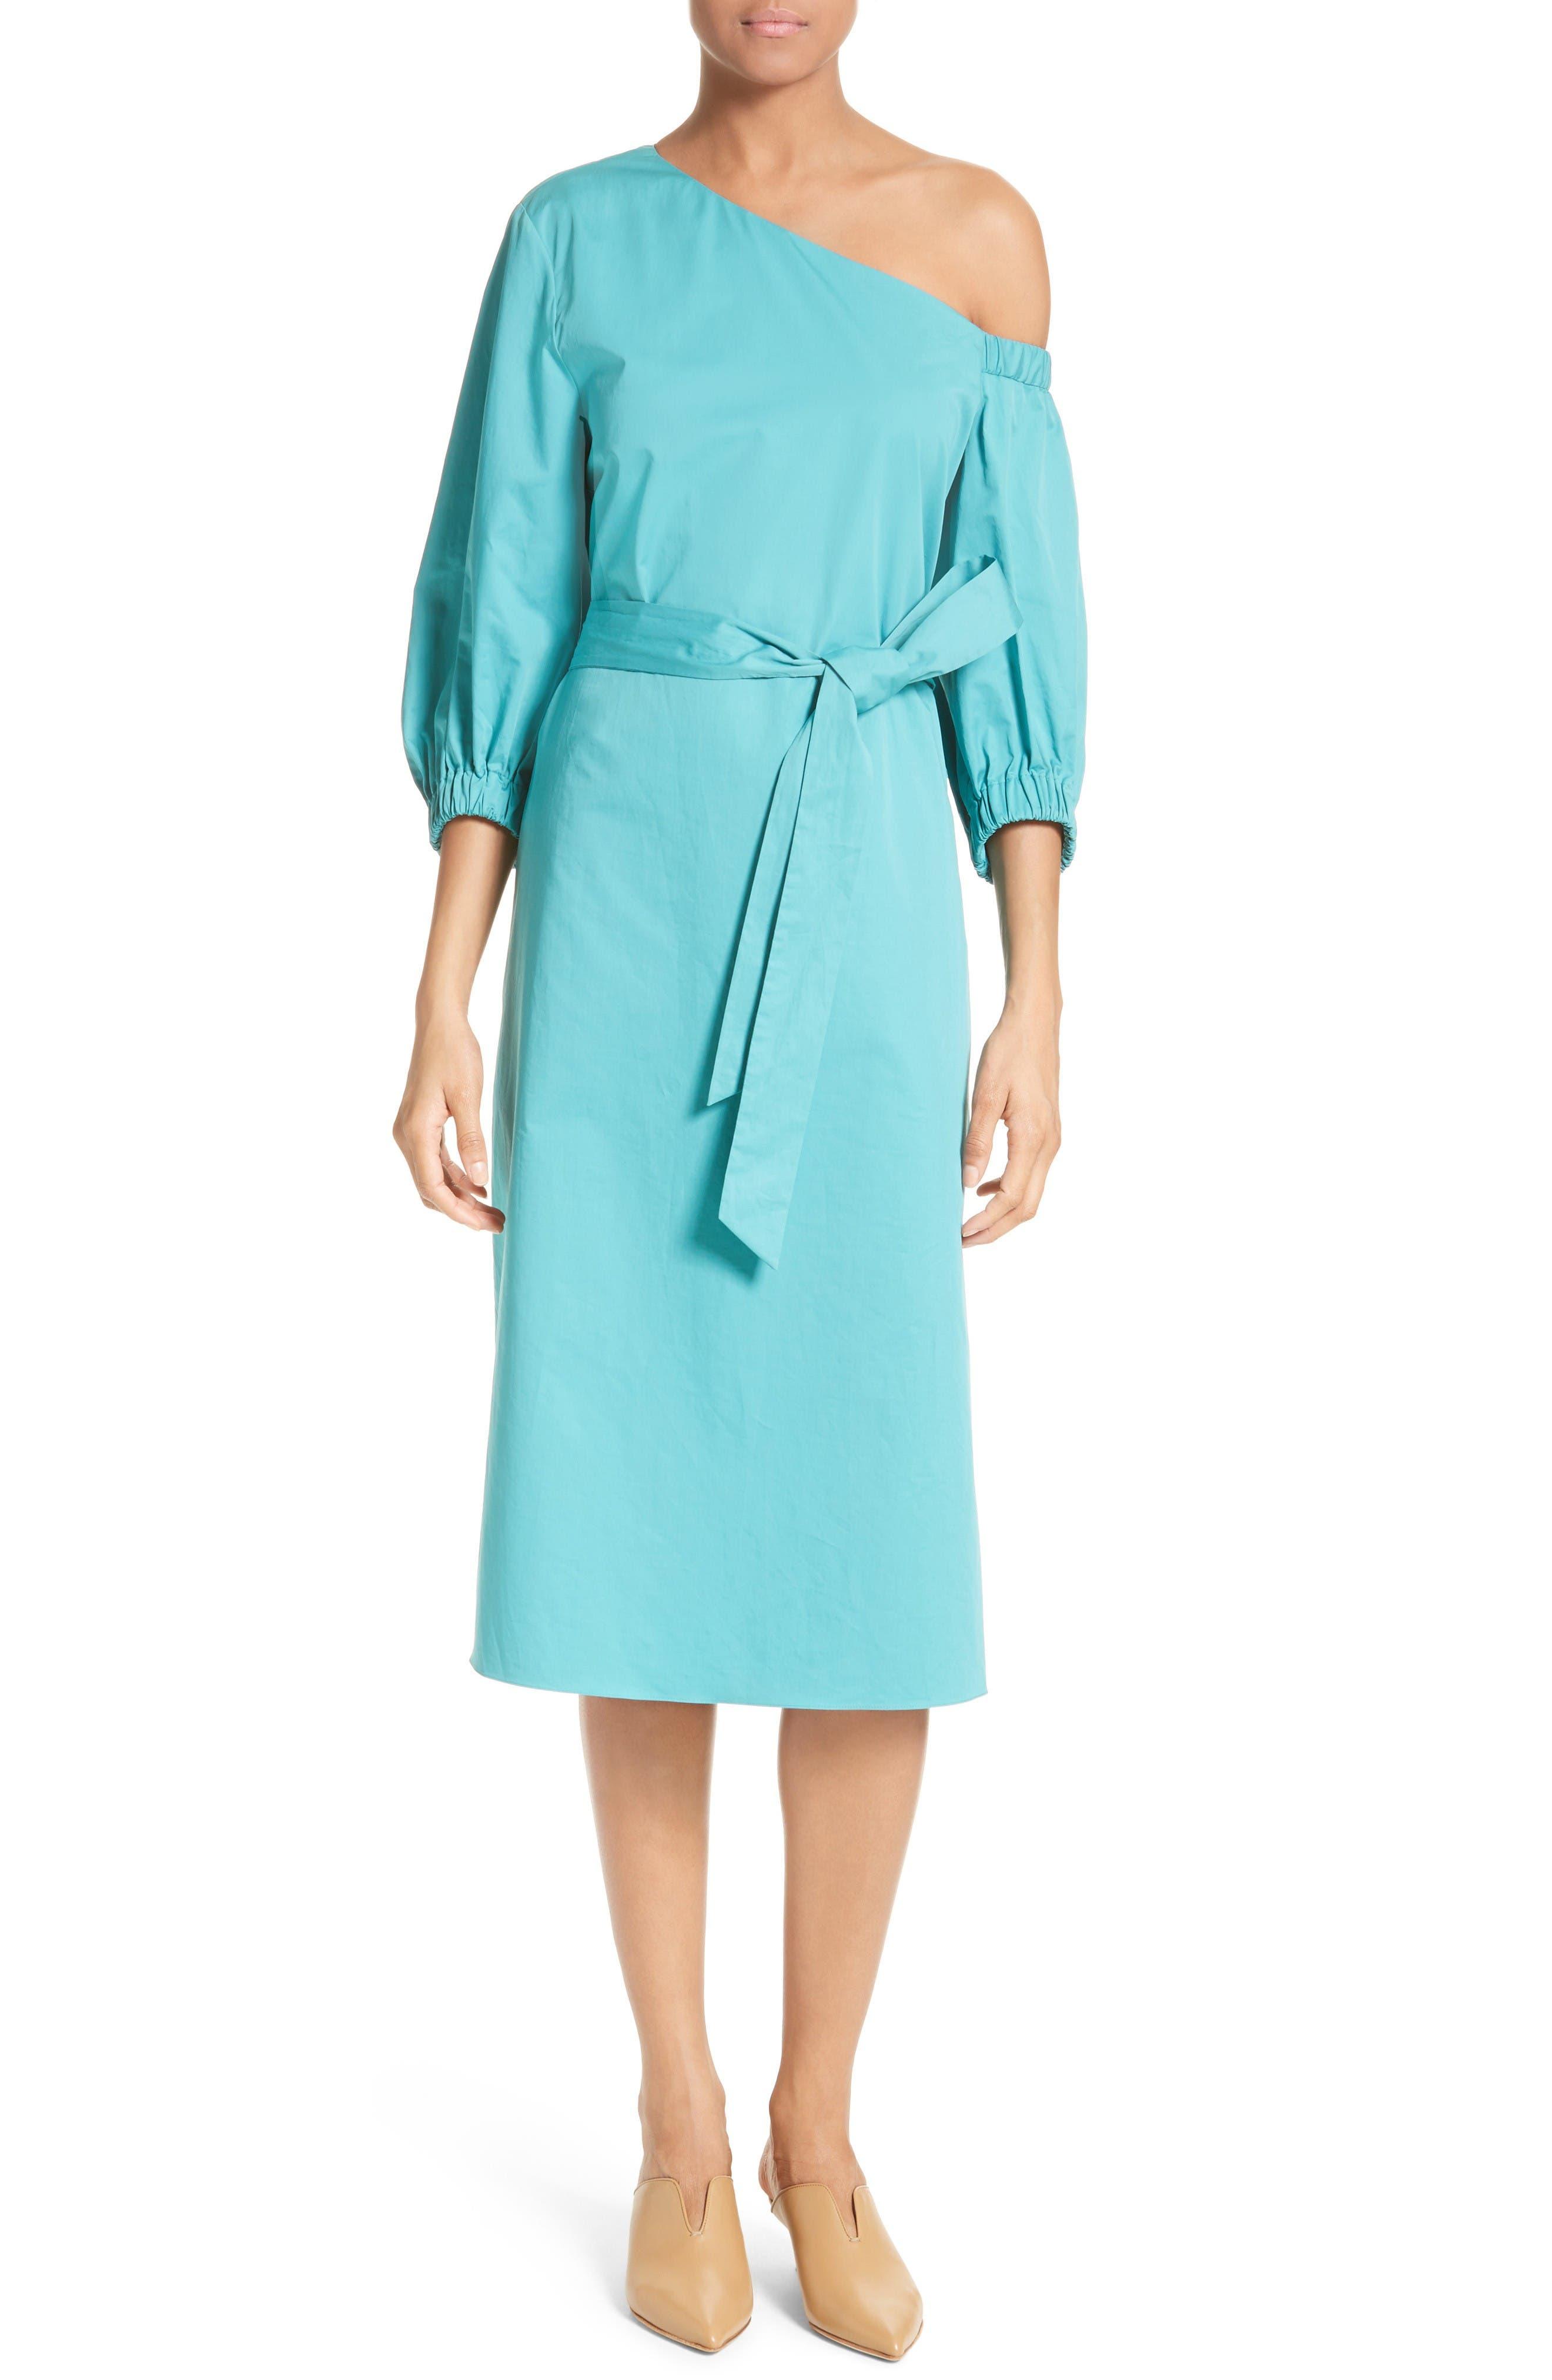 Alternate Image 1 Selected - Tibi Cotton One-Shoulder Dress